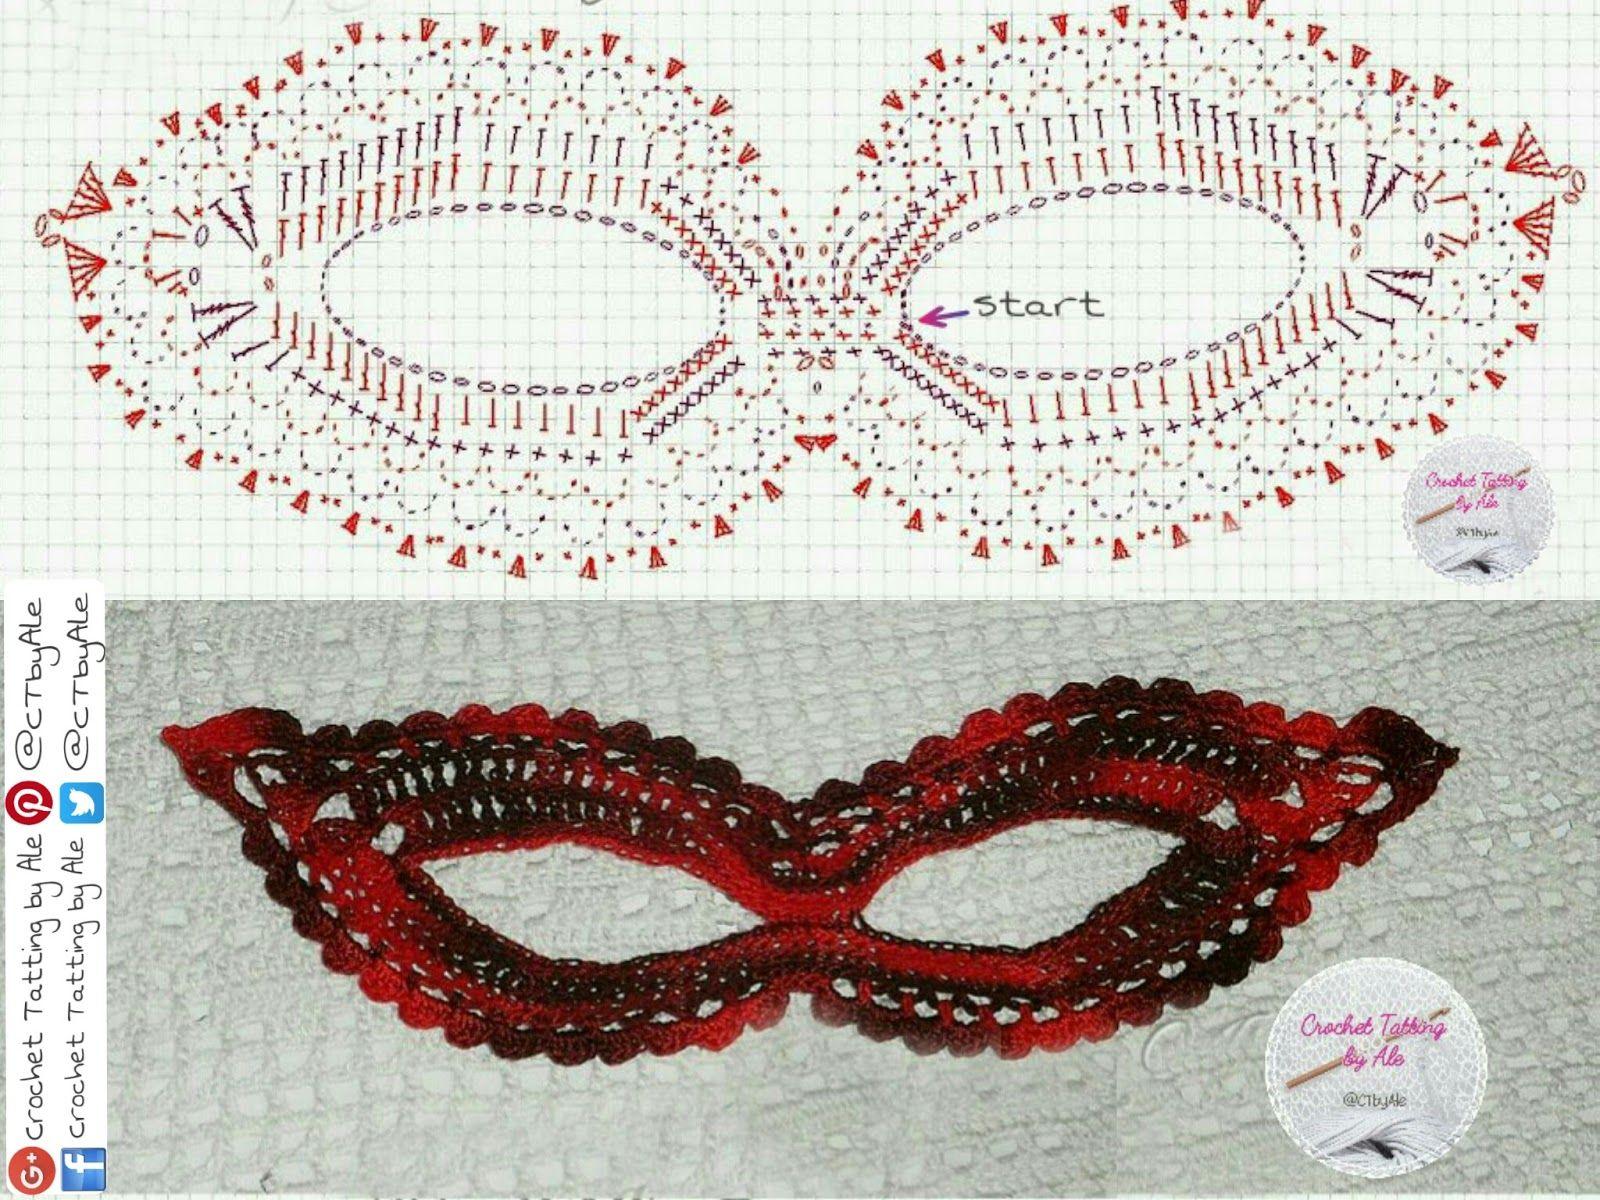 Fantástico Crochet Patrón De Máscara De Esquí Libre Bosquejo - Coser ...